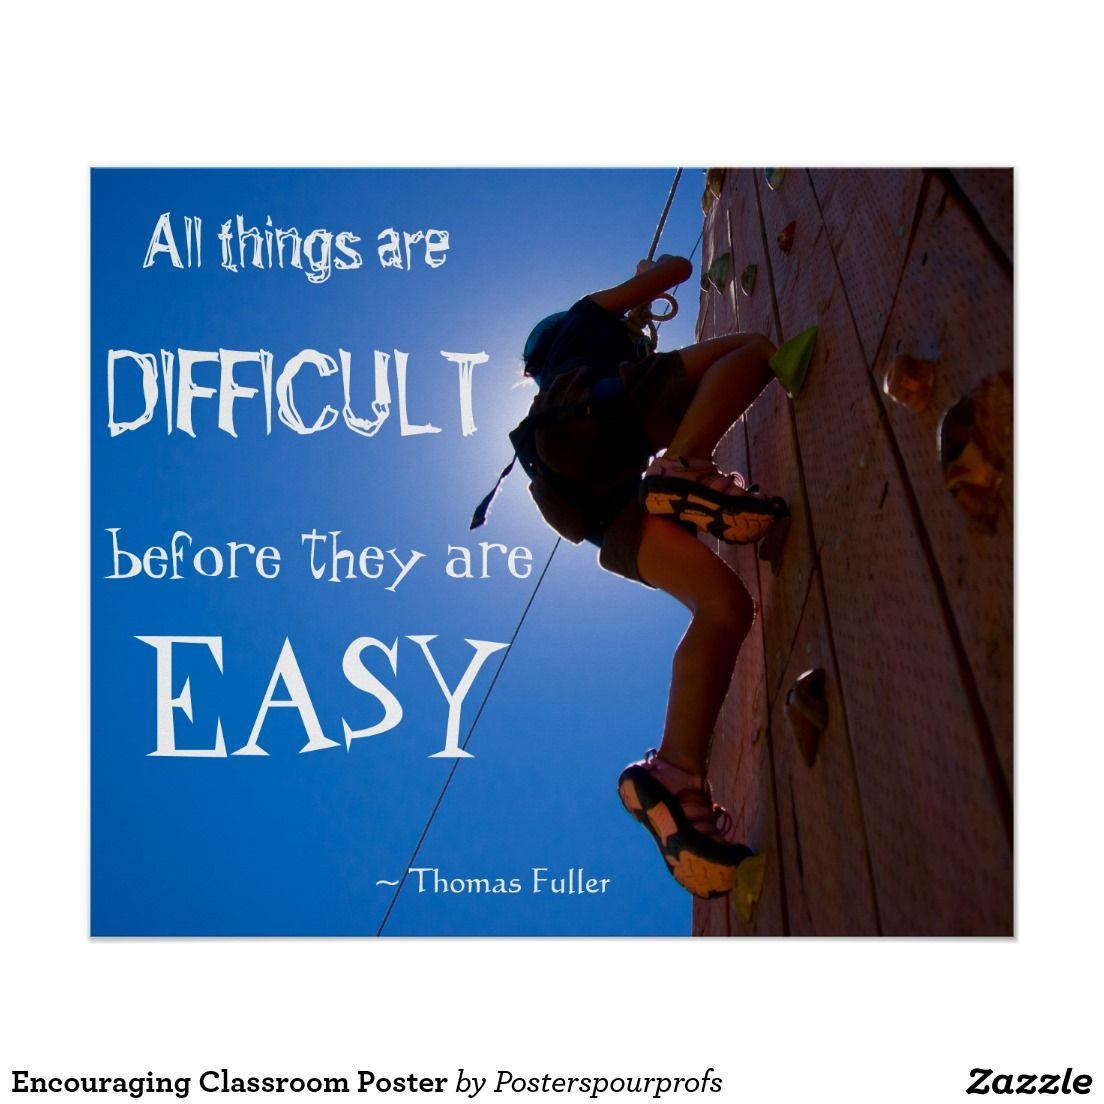 Encouraging Classroom Poster